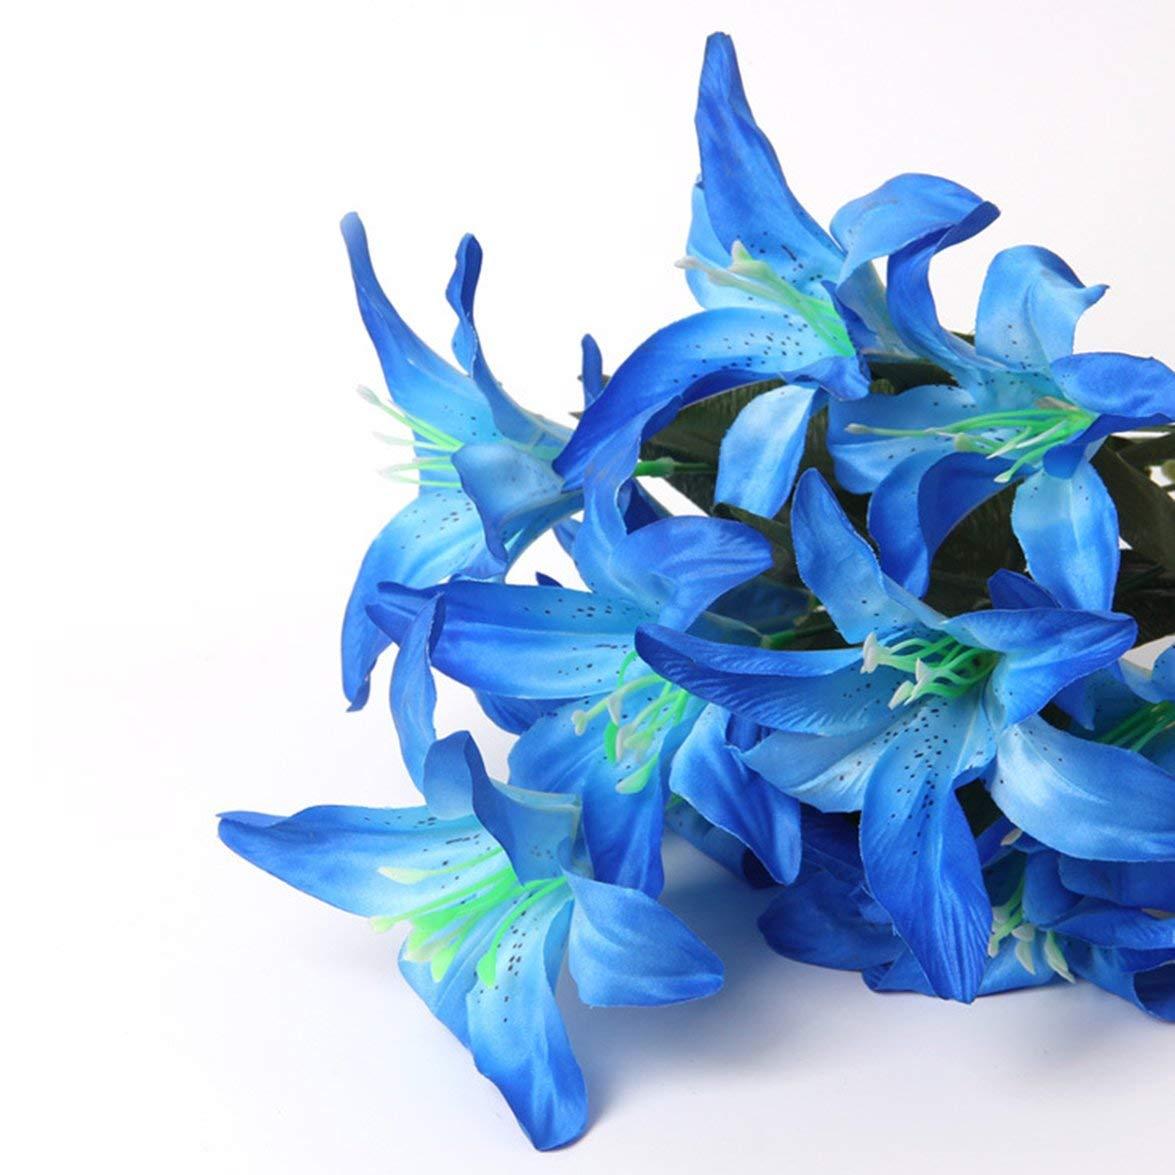 MqbY ヨーロピアン人工シルクフラワーヘッド イミテーションユリの花 DIYクラフト 造花 結婚式 ホームパーティー装飾 ブルー MqbY B07RCX4W24 ブルー